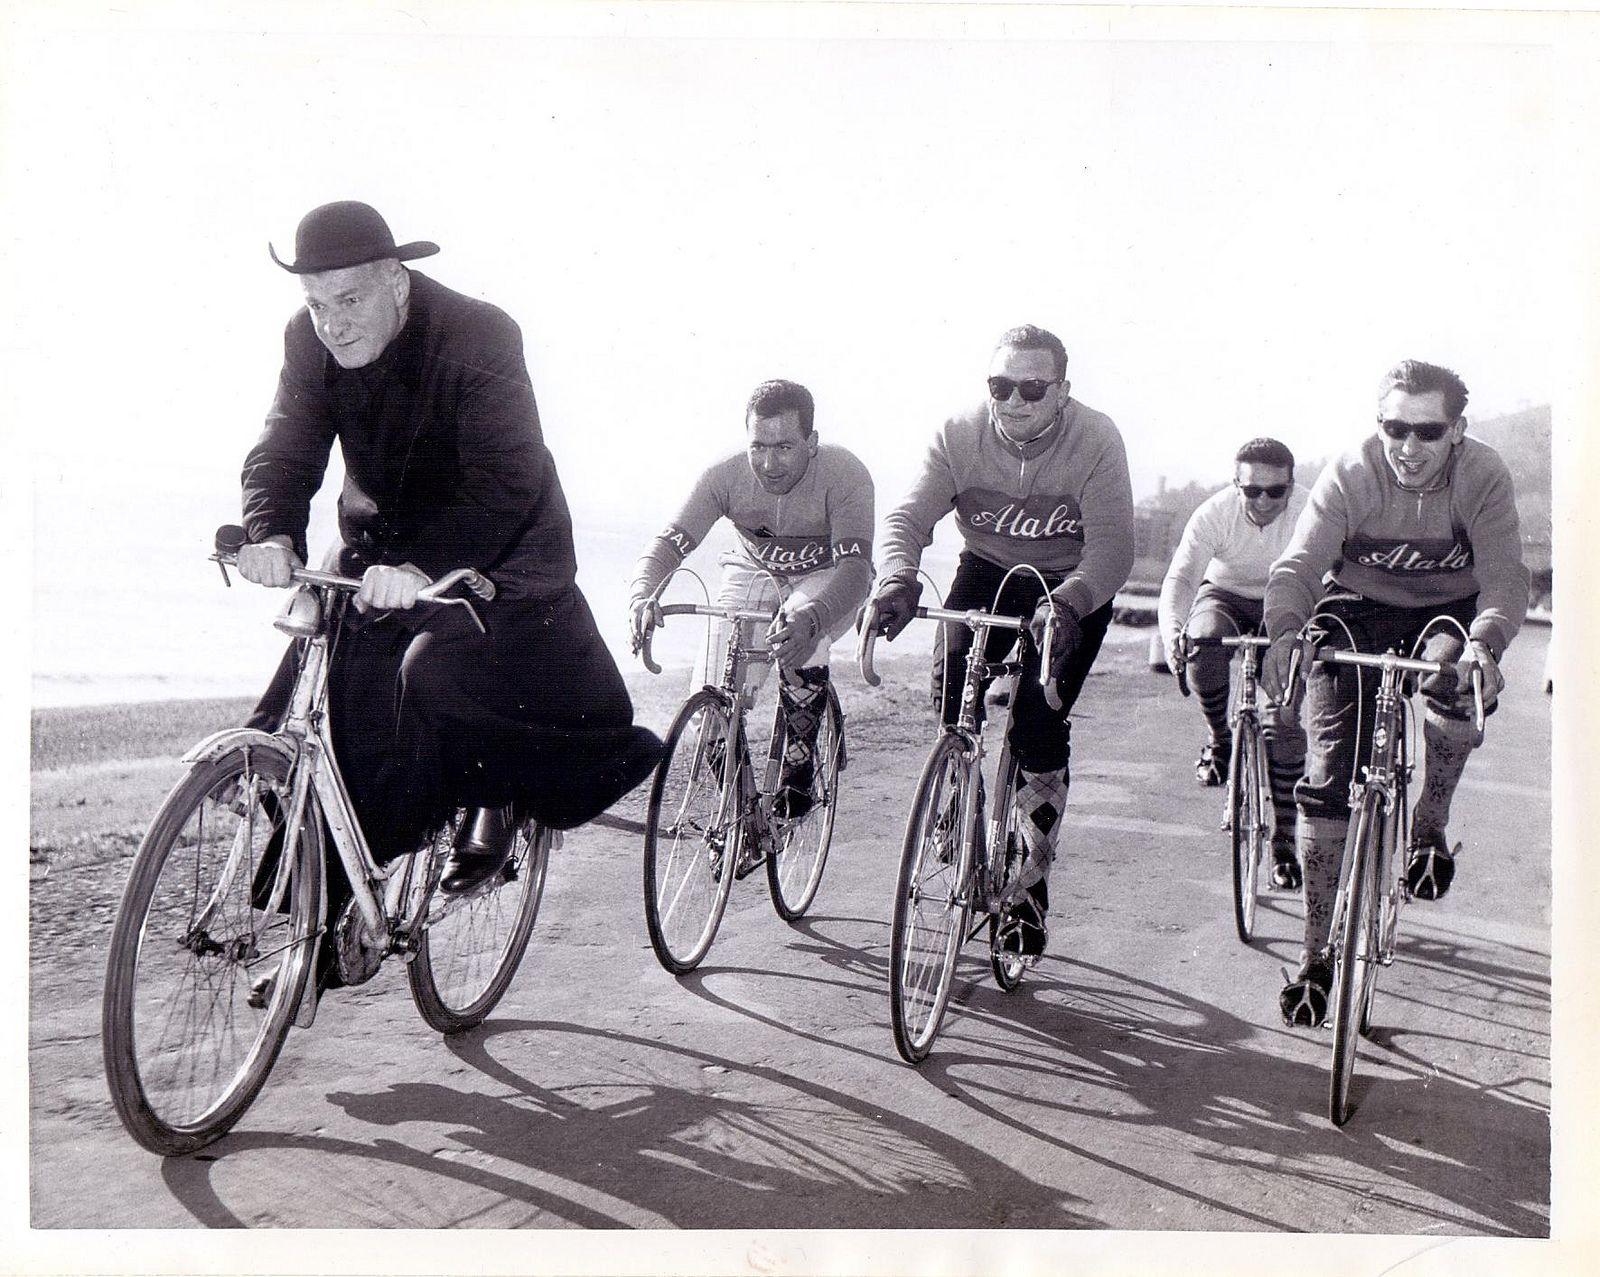 Local priest on same route as Training run for 1959 Giro d Italia. Monti 2c9413bd4